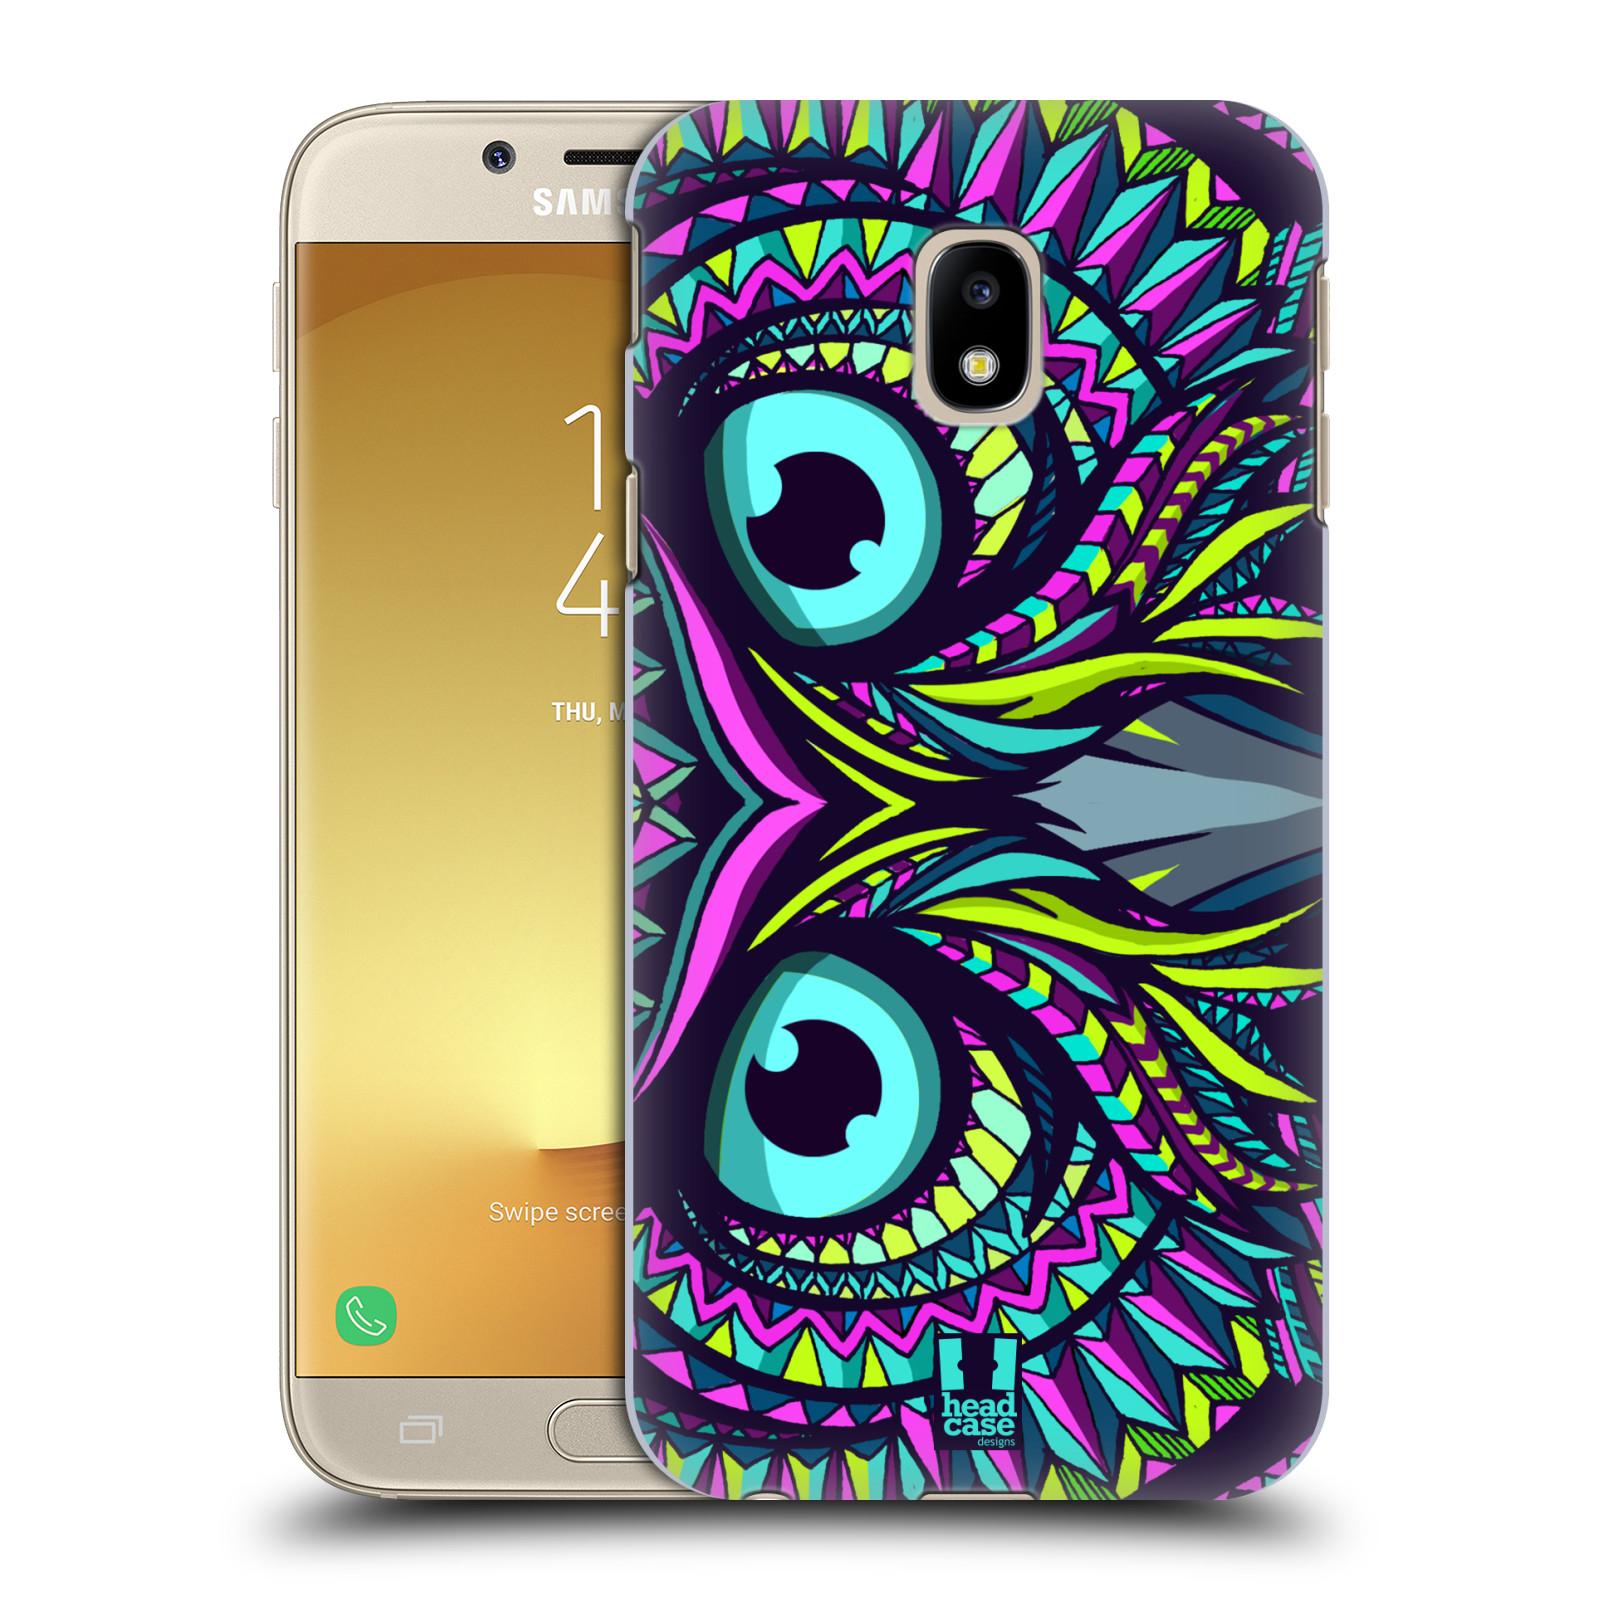 Plastové pouzdro na mobil Samsung Galaxy J3 (2017) - Head Case - AZTEC SOVA